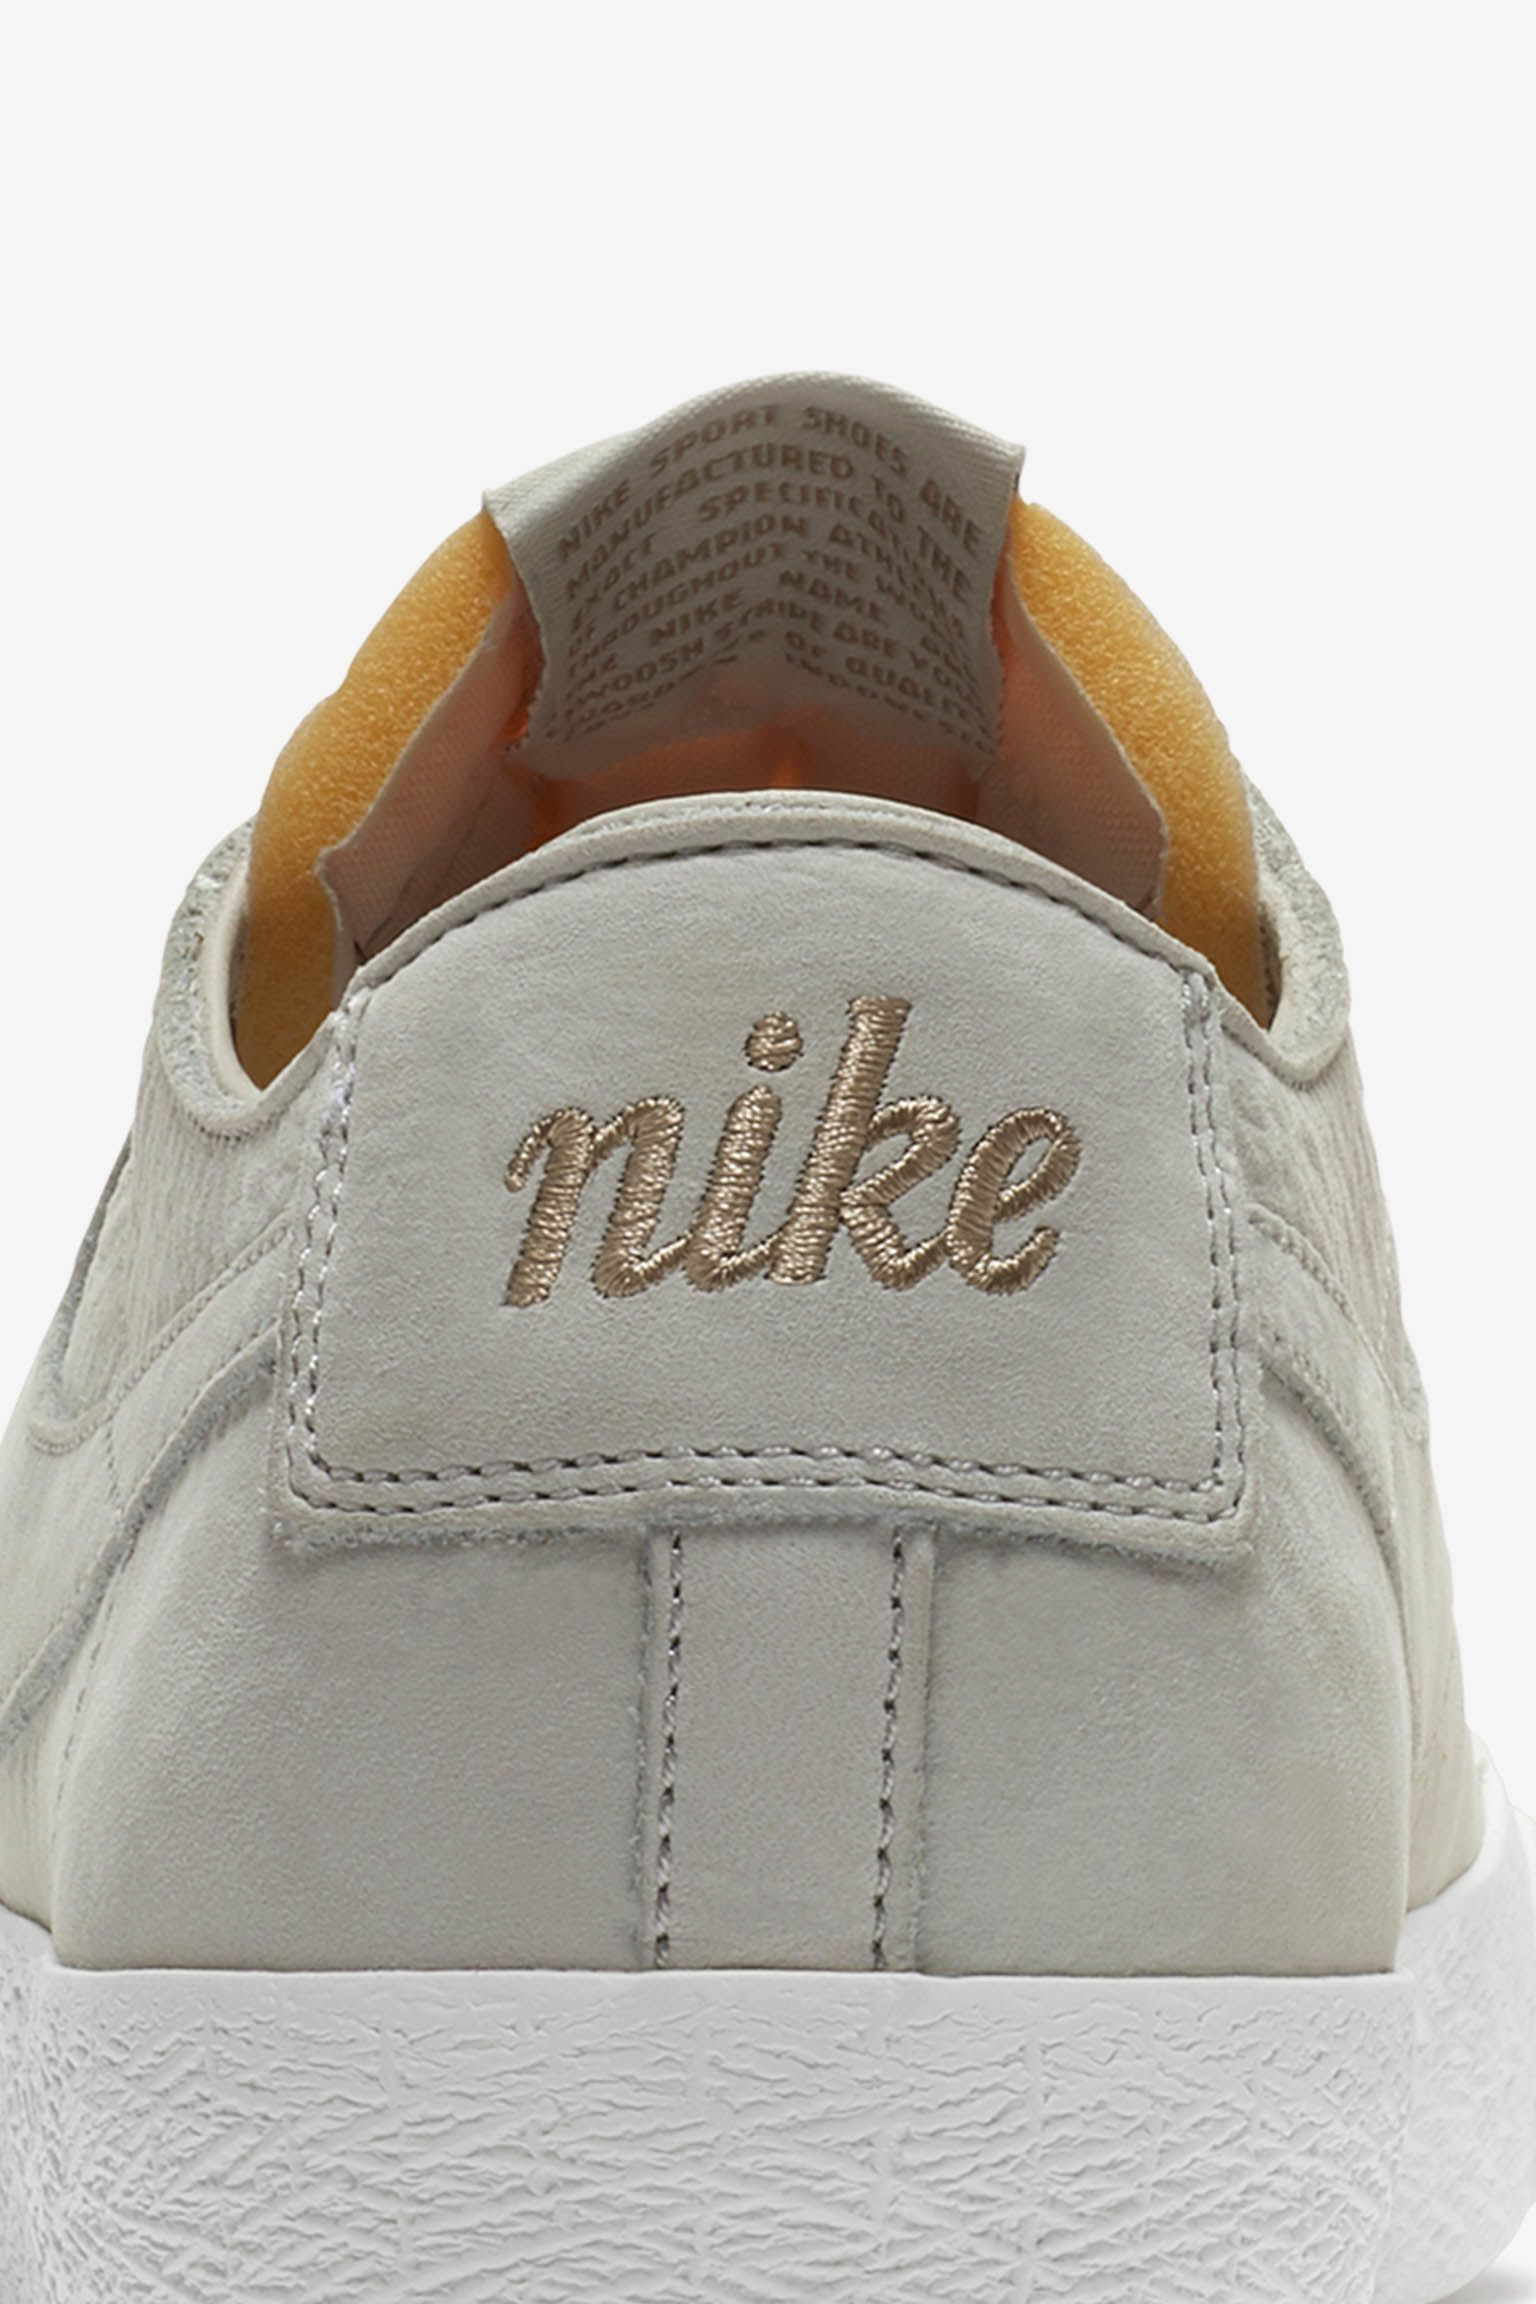 Nike SB Blazer Decon 'Light Bone & Khaki' 发布日期